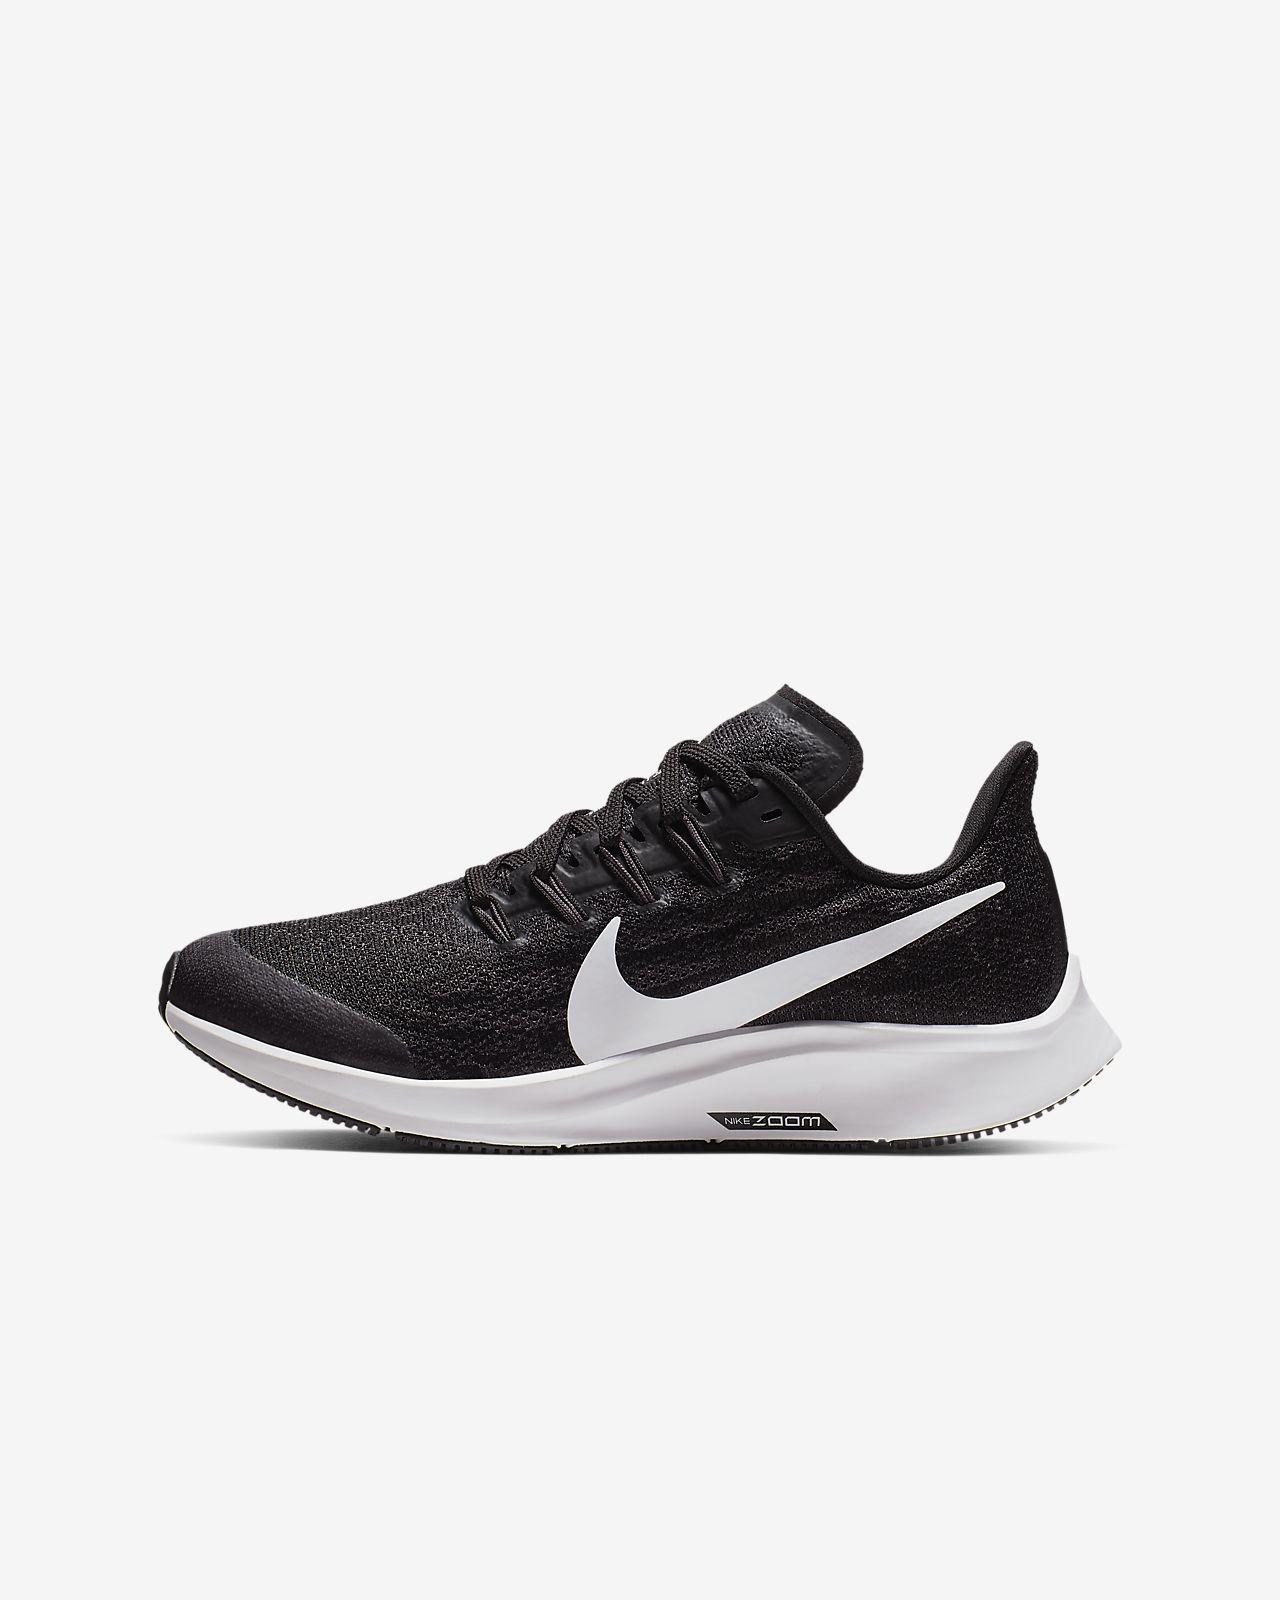 Nike Air Zoom Pegasus 36 Küçük/Genç Çocuk Koşu Ayakkabısı